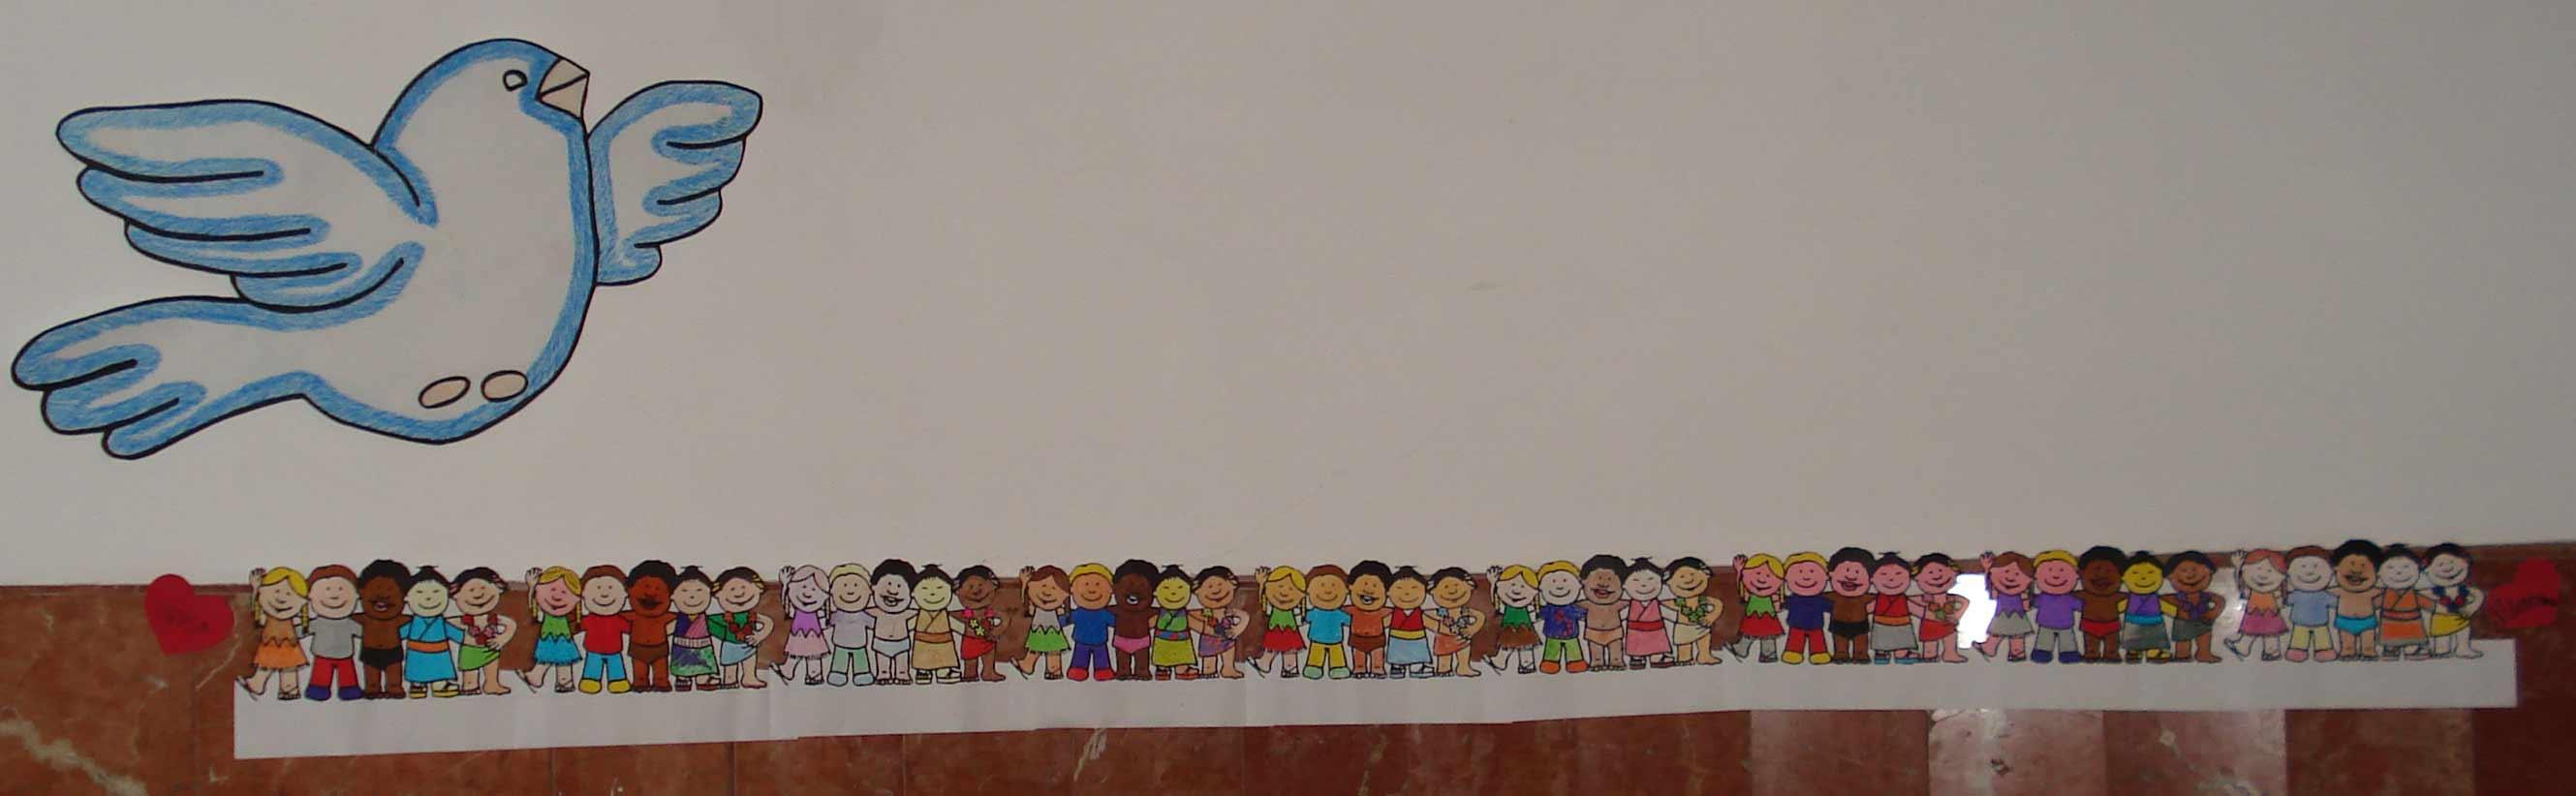 mural-paz-5